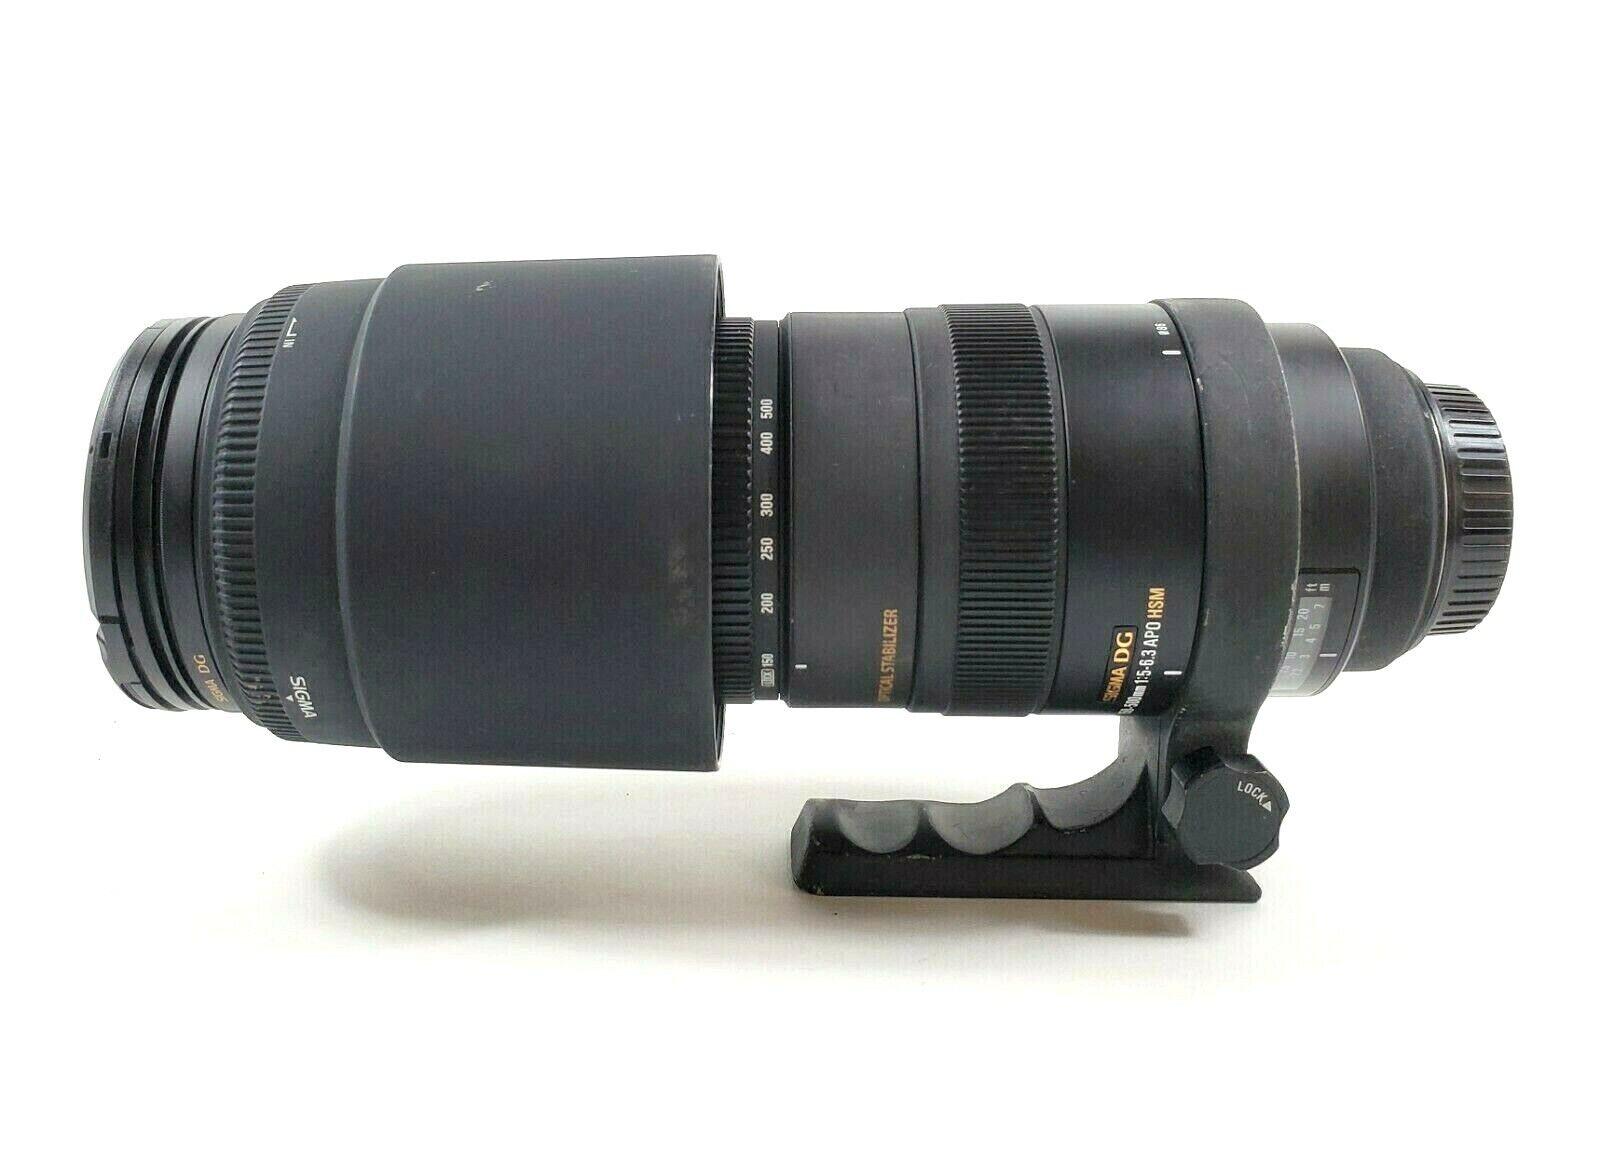 Sigma DG For Canon 150-500mm 1 5-6.3 APO HSM Lens Optical Stabilizer lot 5-3-24 - $415.00